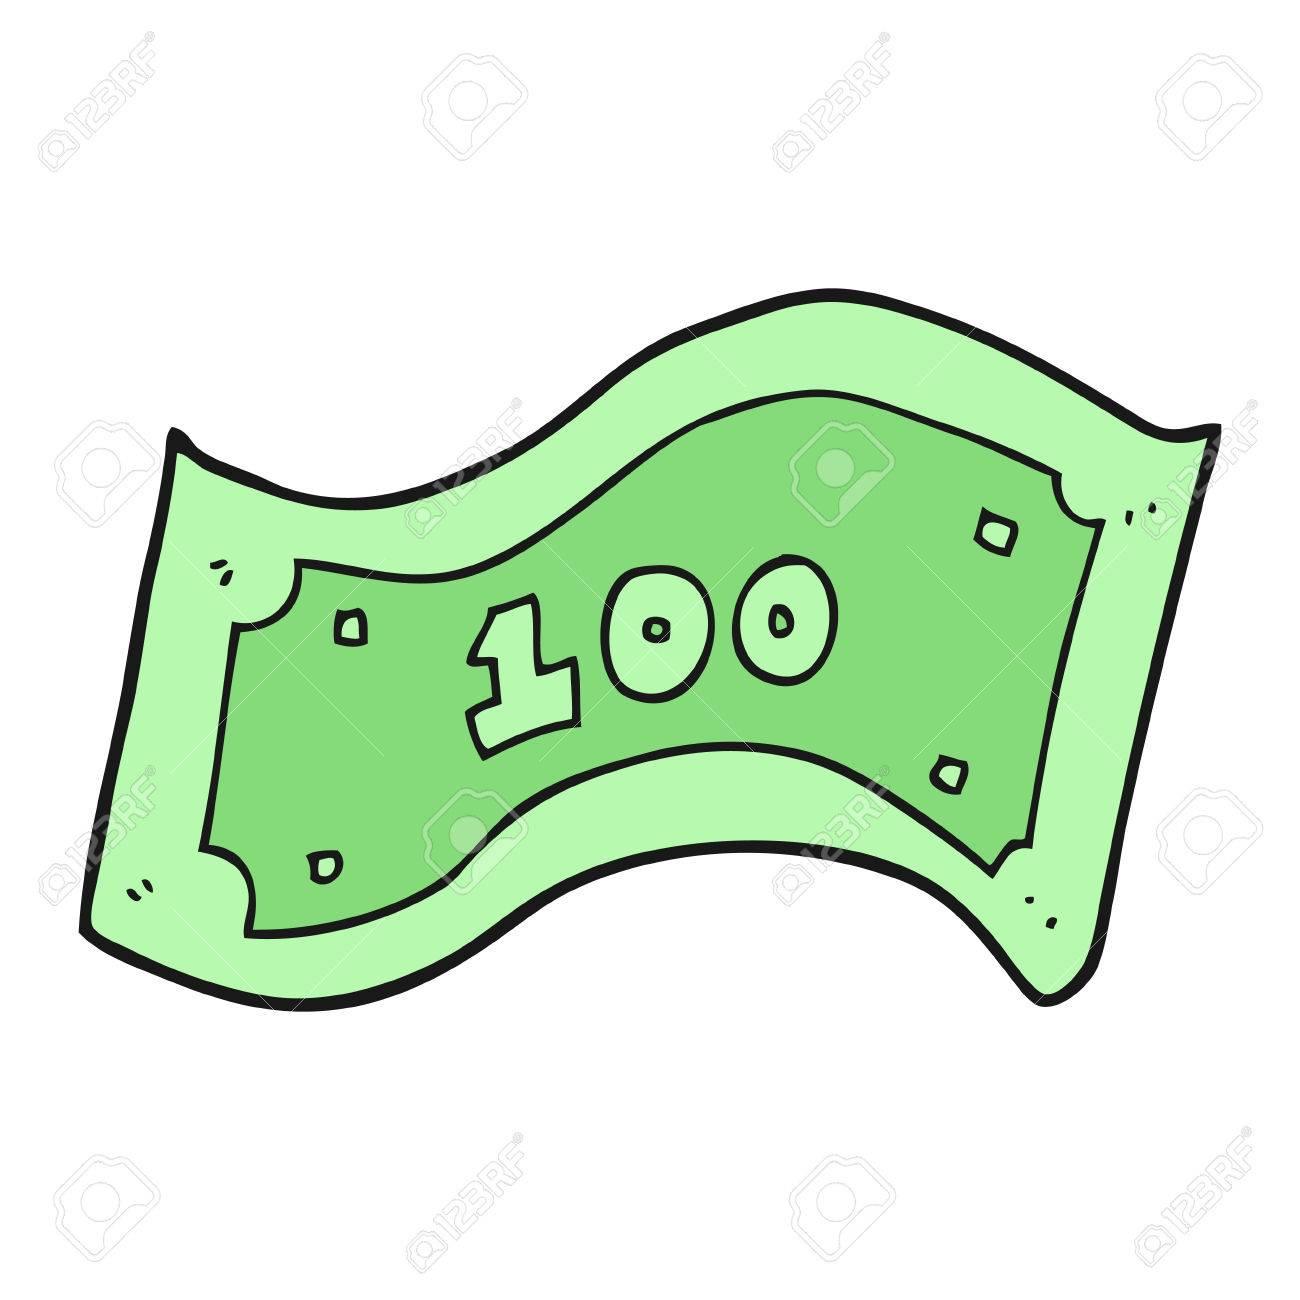 freehand drawn cartoon 100 dollar bill royalty free cliparts rh 123rf com one dollar bill vector 100 dollar bill vector